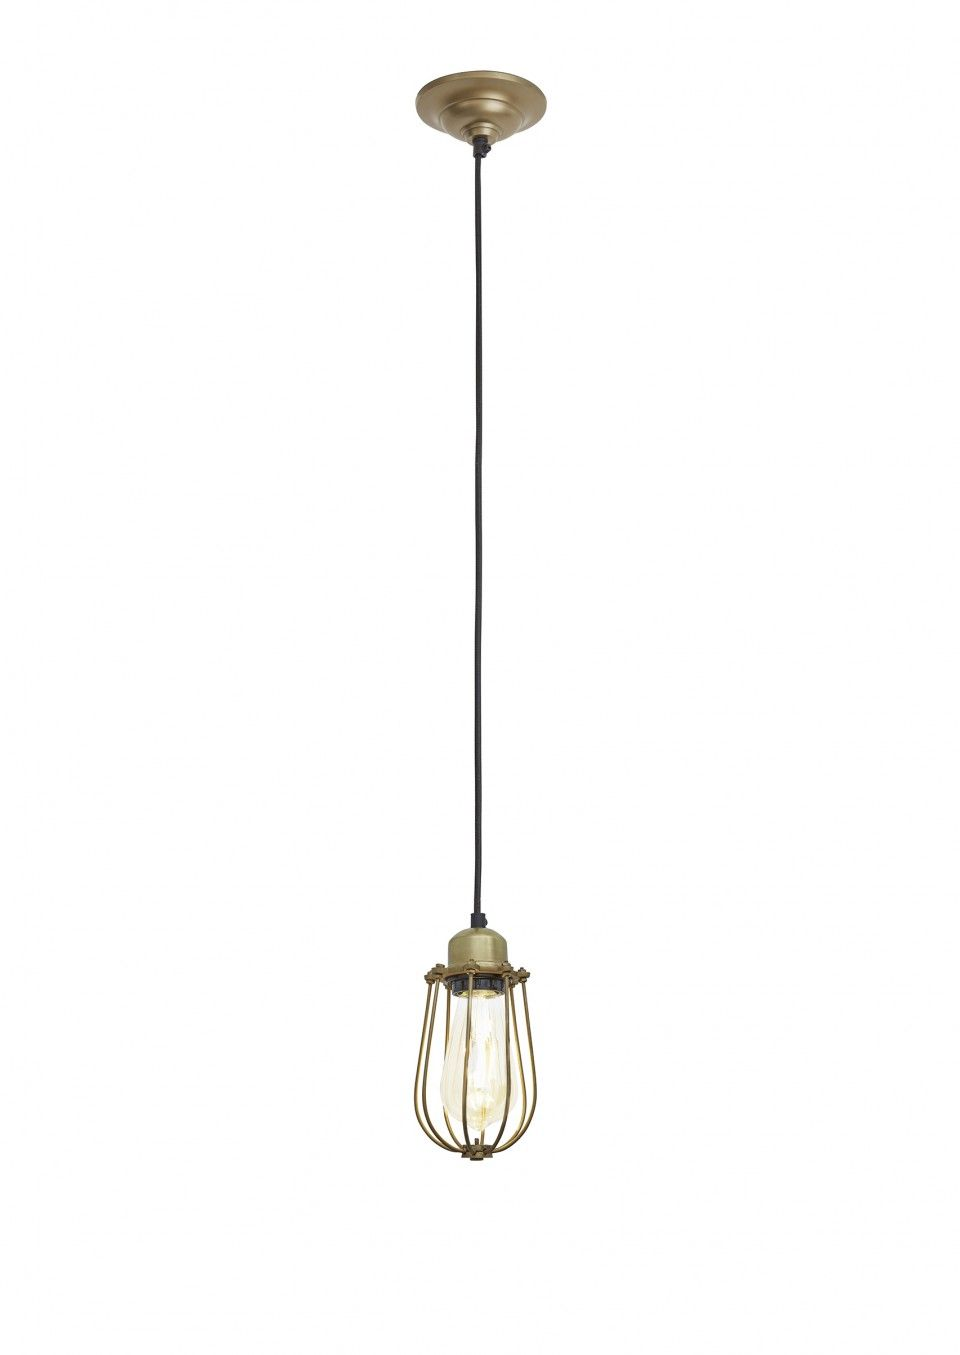 This stylish orlando vintage cage pendant light by industville is an this stylish orlando vintage cage pendant light by industville is an awesome handmade wire lampshade in arubaitofo Choice Image